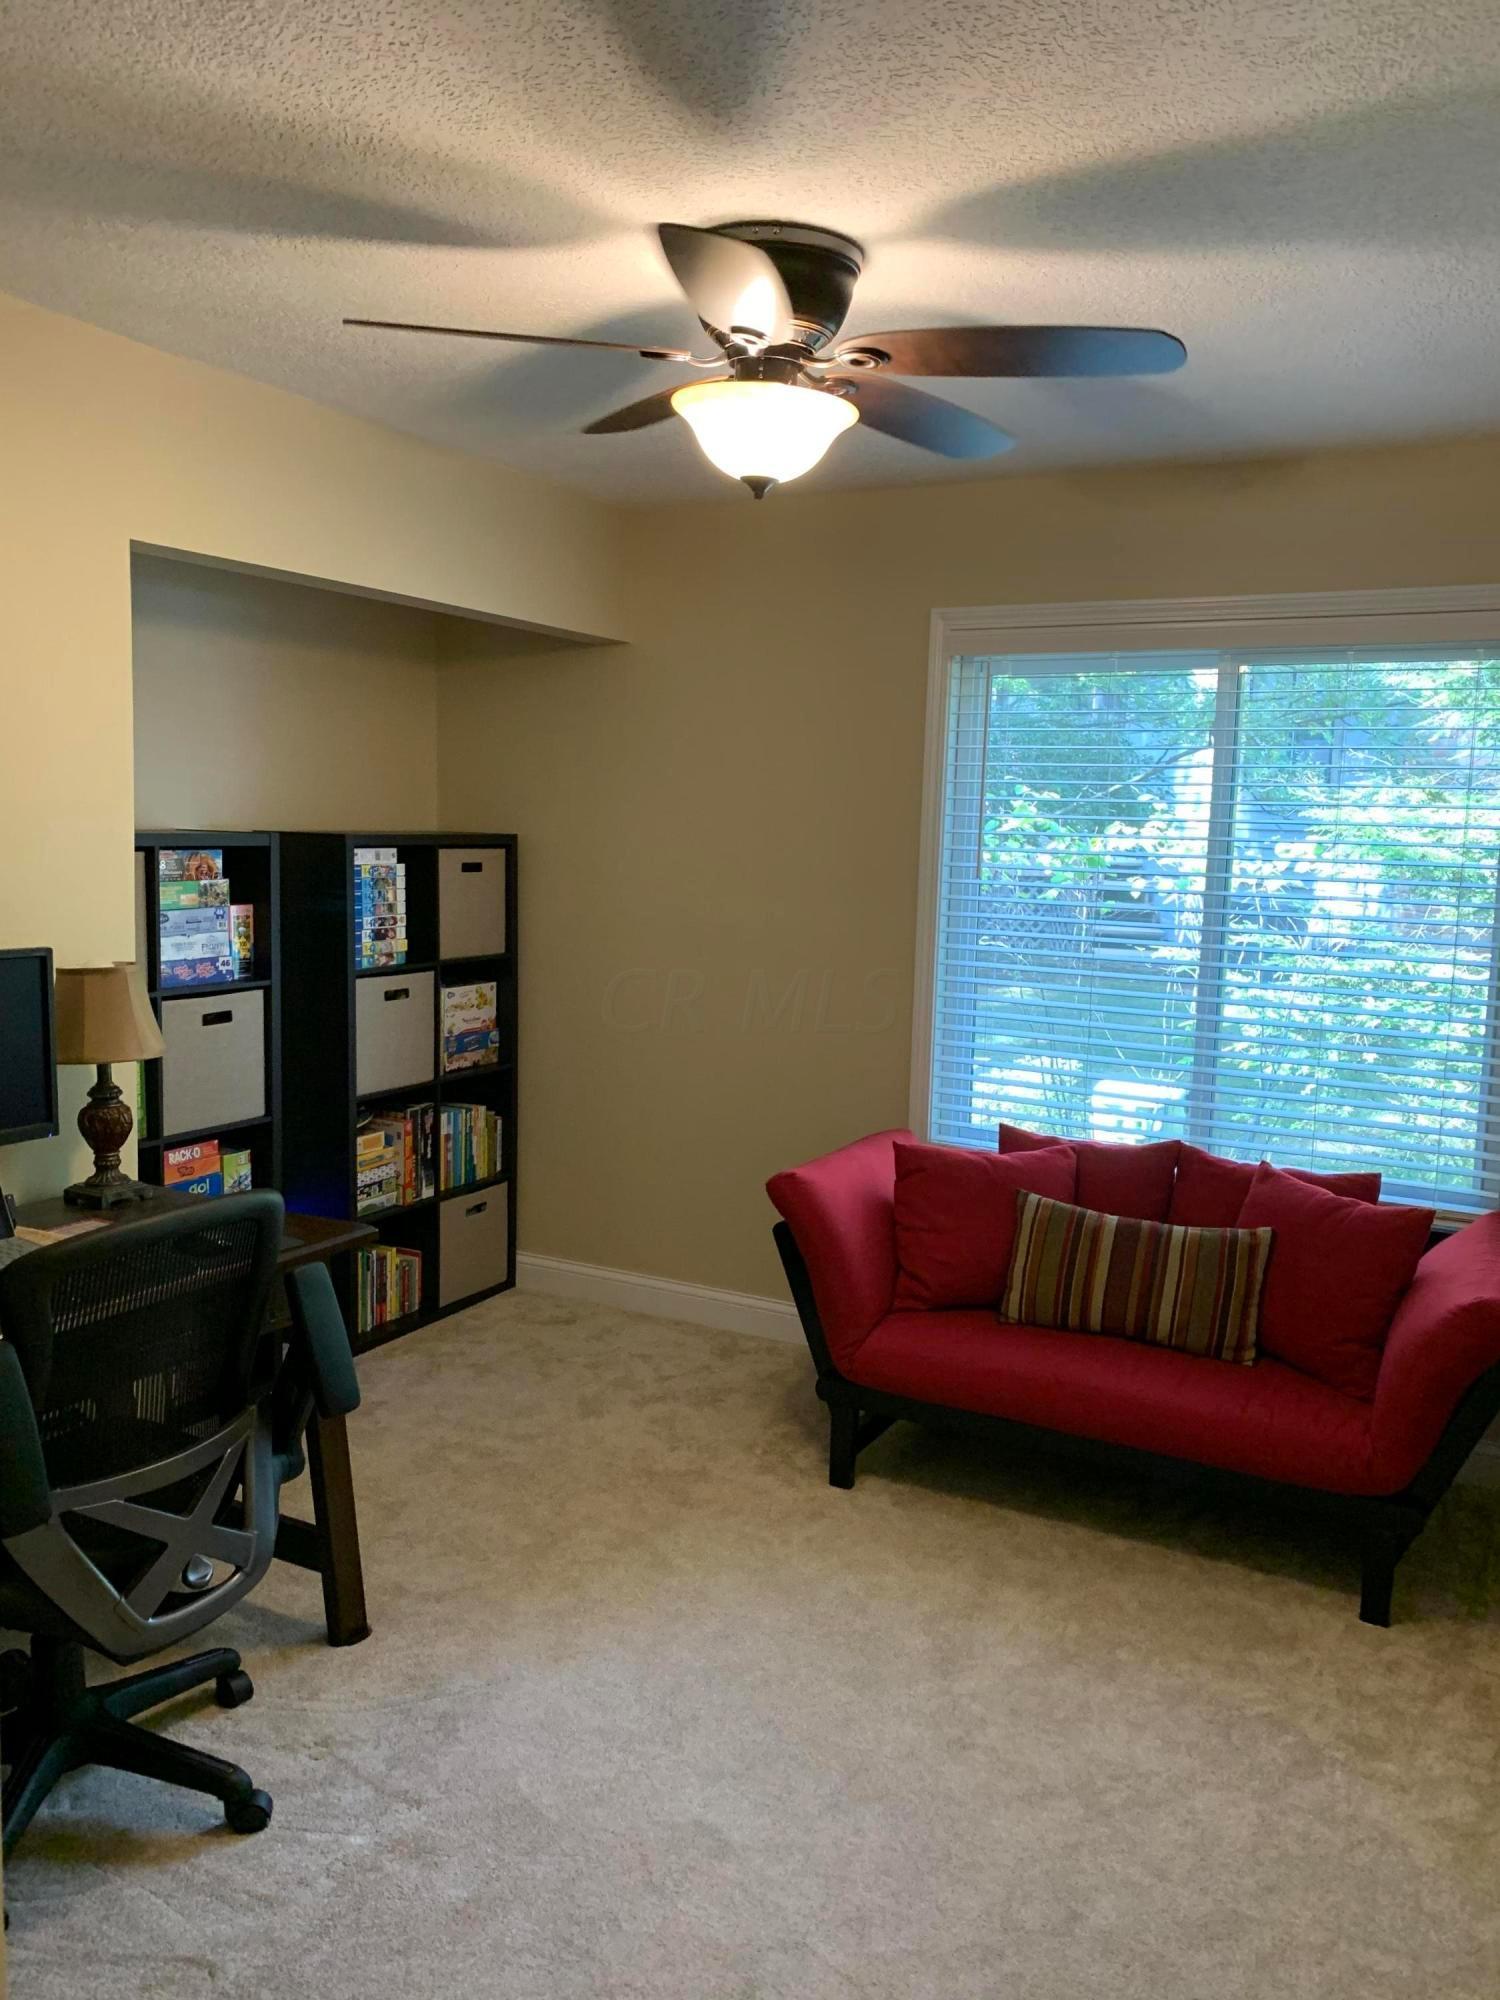 7851 Bartles Avenue, Dublin, Ohio 43017, 3 Bedrooms Bedrooms, ,3 BathroomsBathrooms,Residential,For Sale,Bartles,220031466